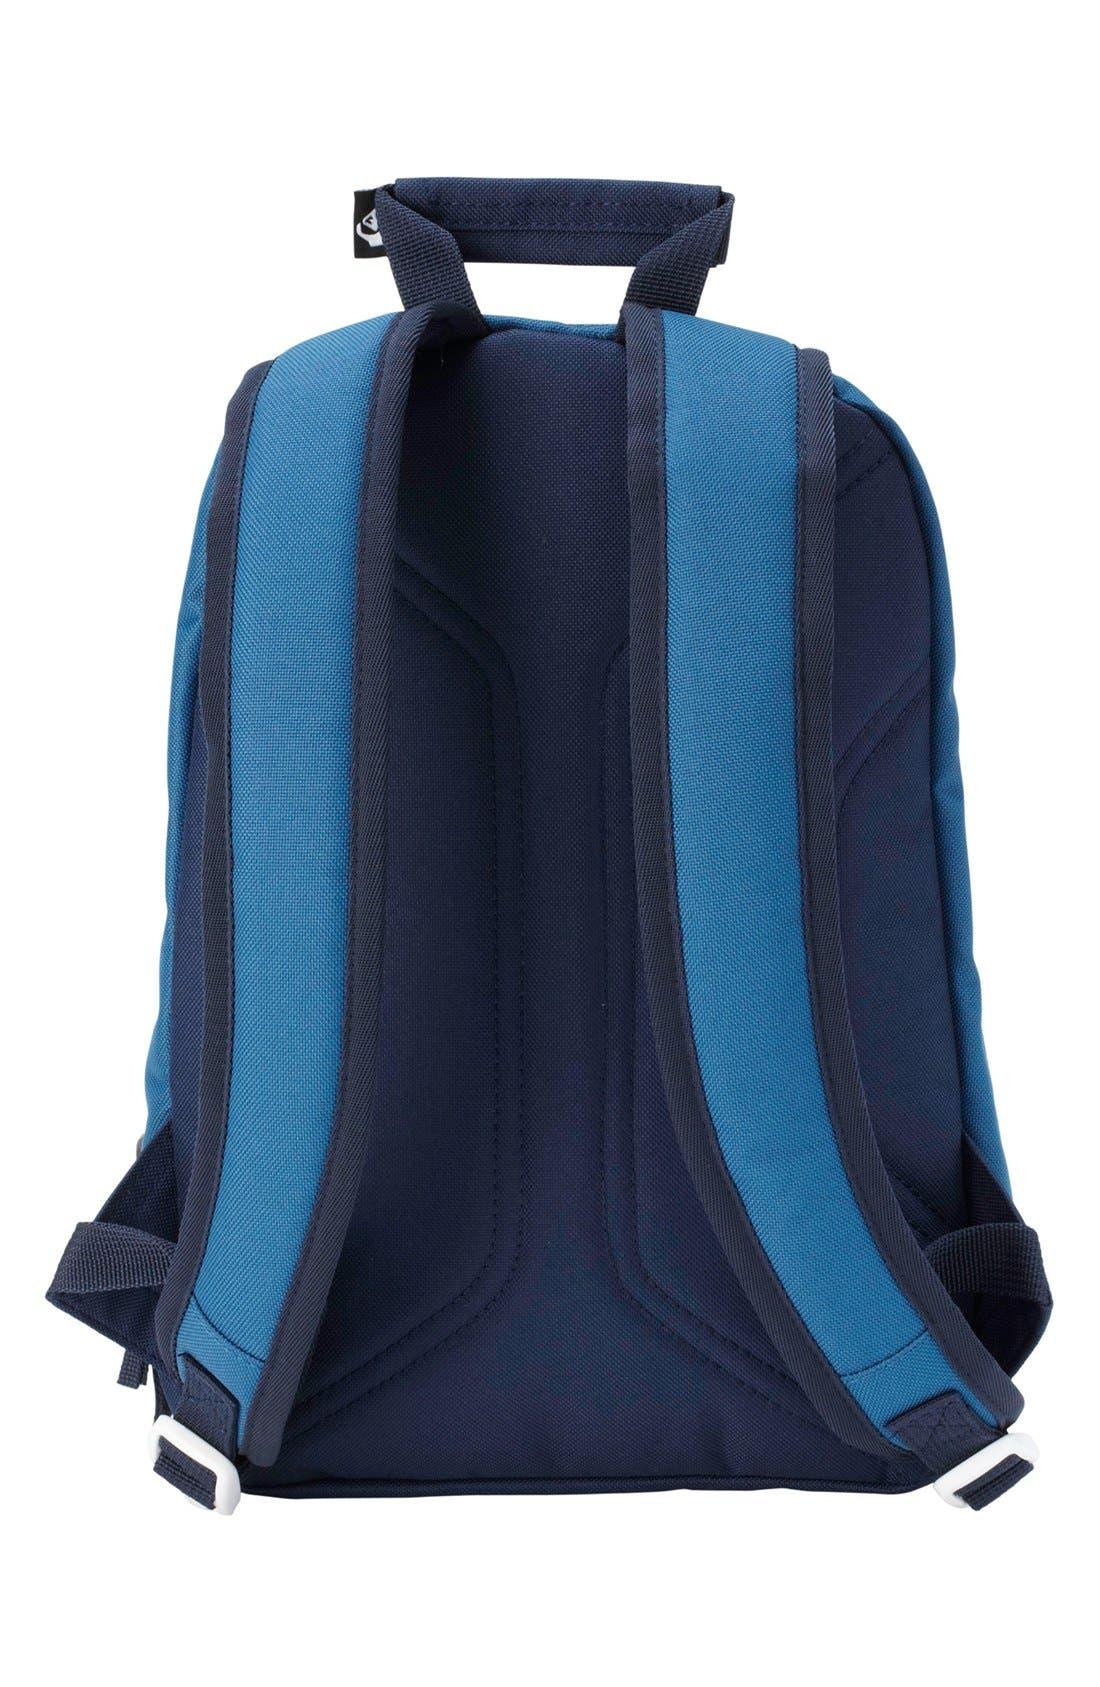 Alternate Image 4  - Quiksilver 'Chomper' Backpack